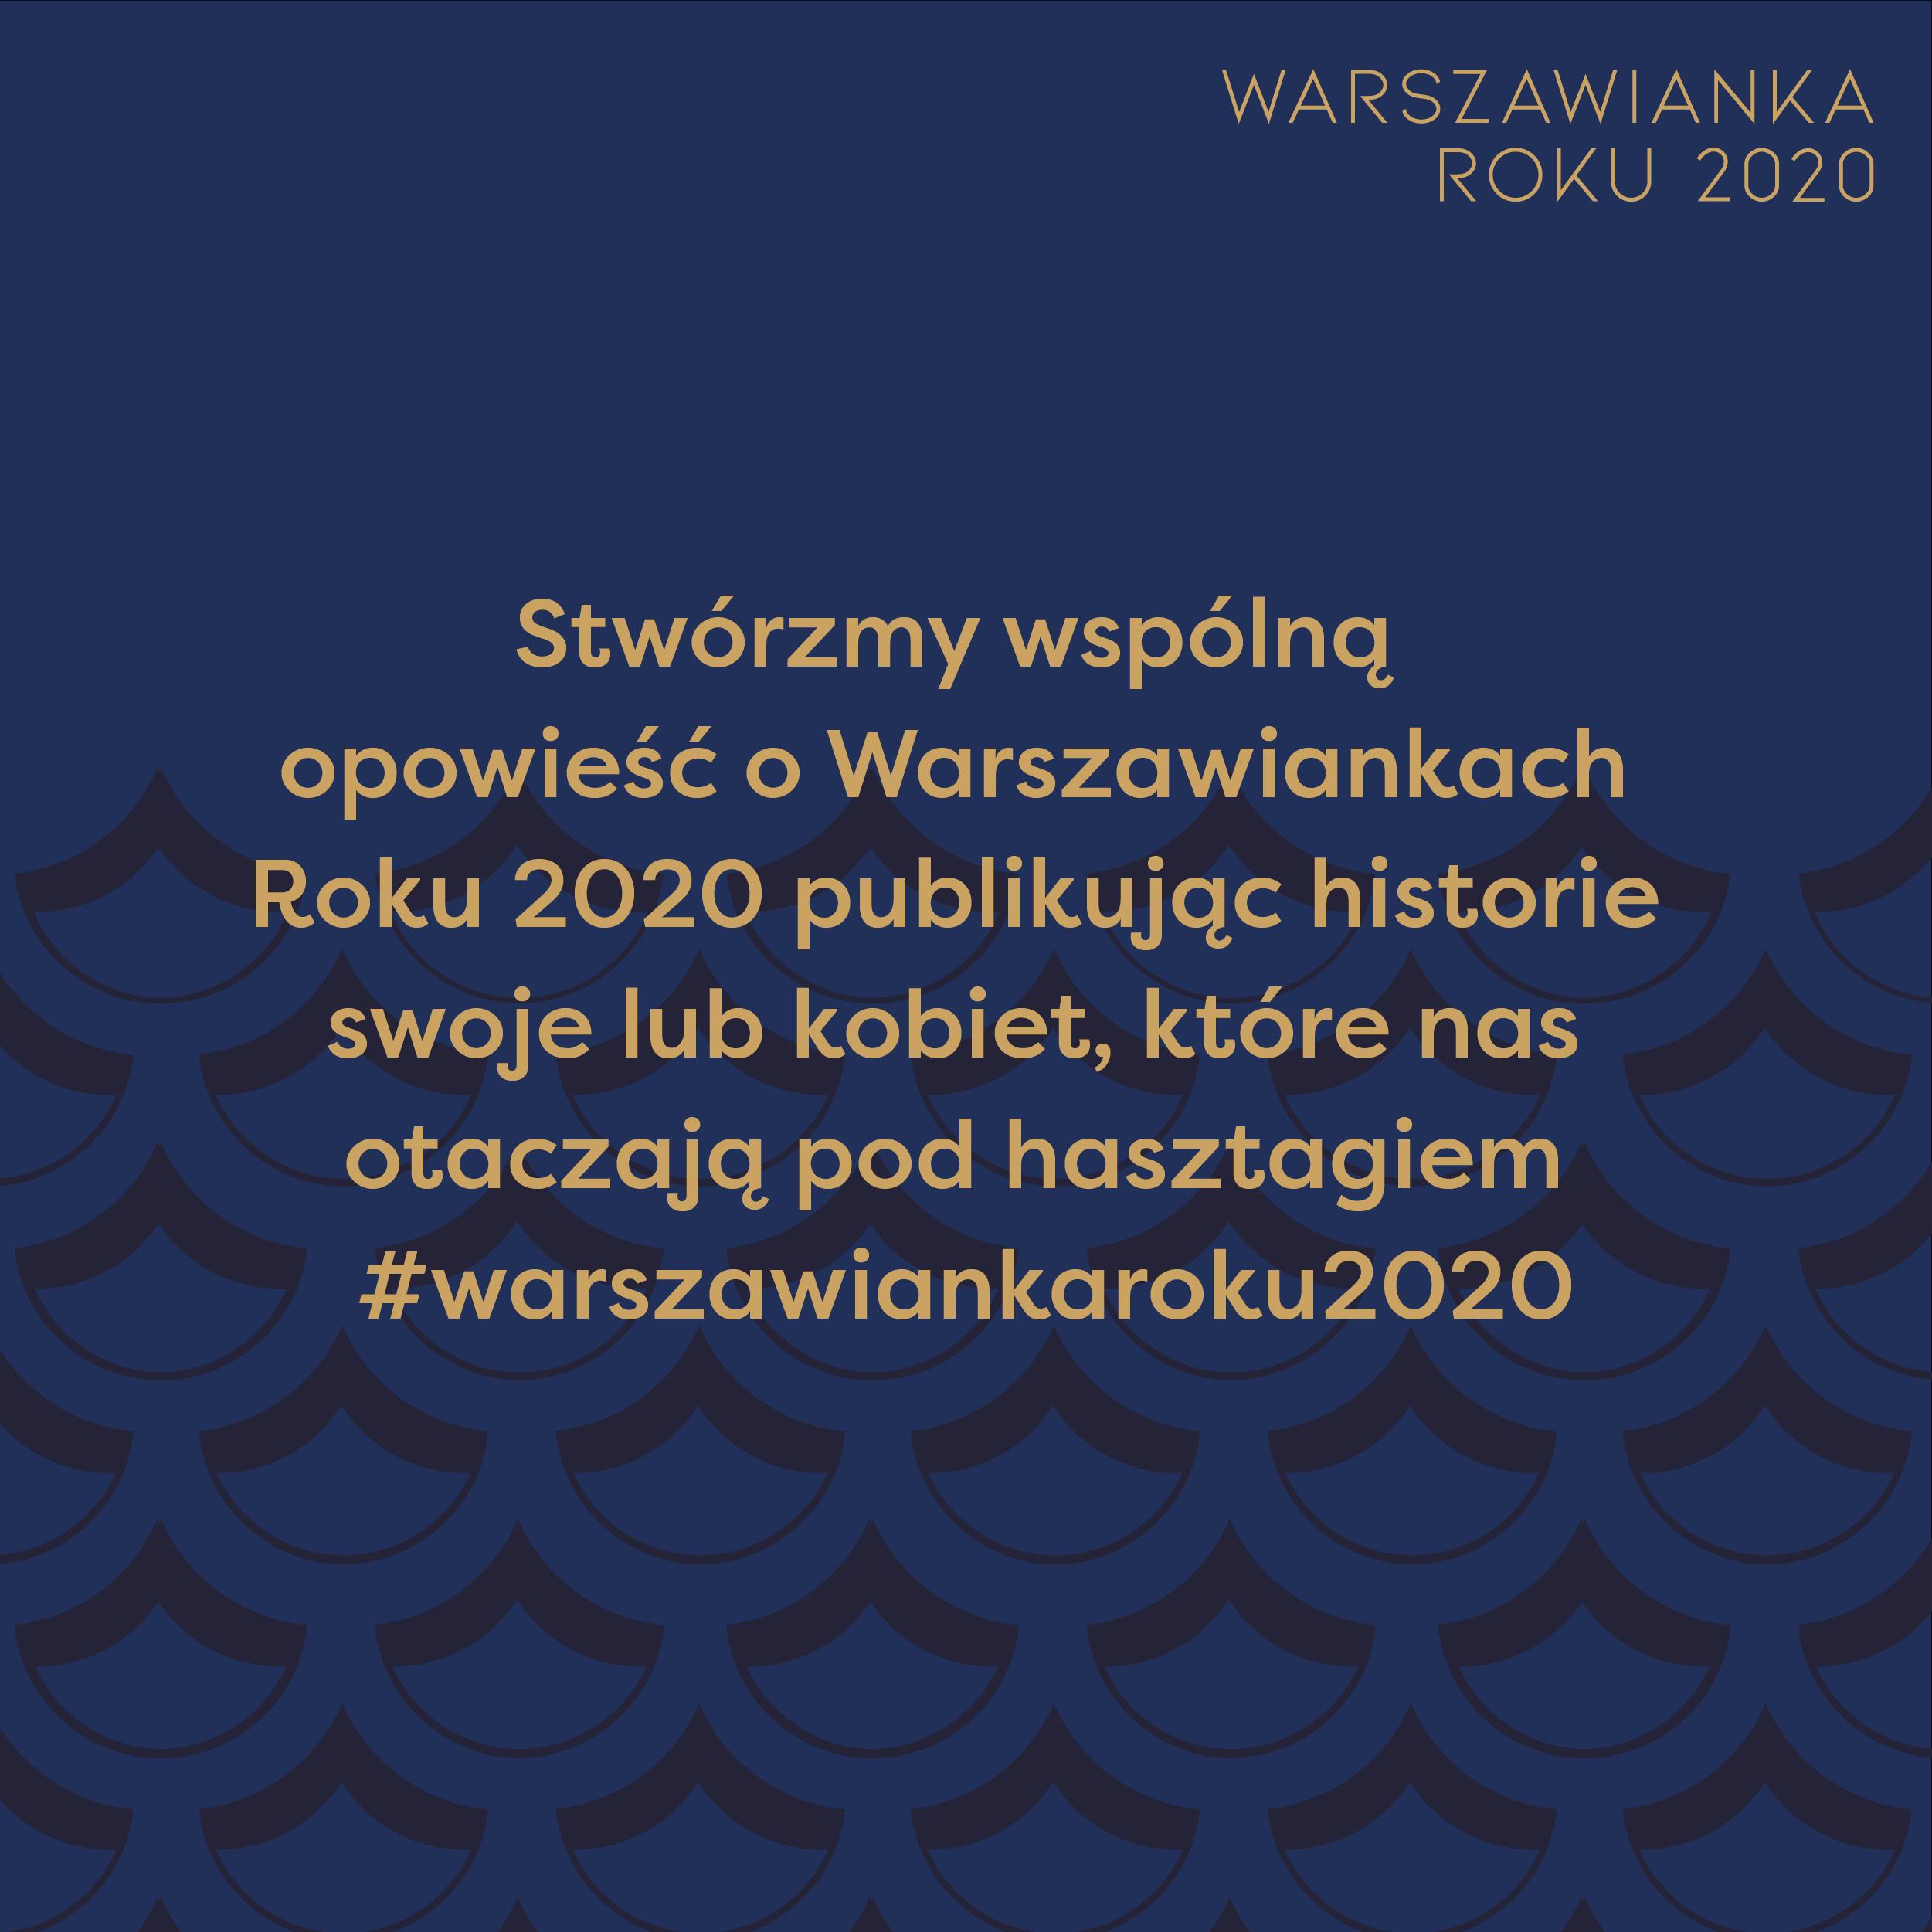 WARSZAWIANKA_SM_POST_CYTAT